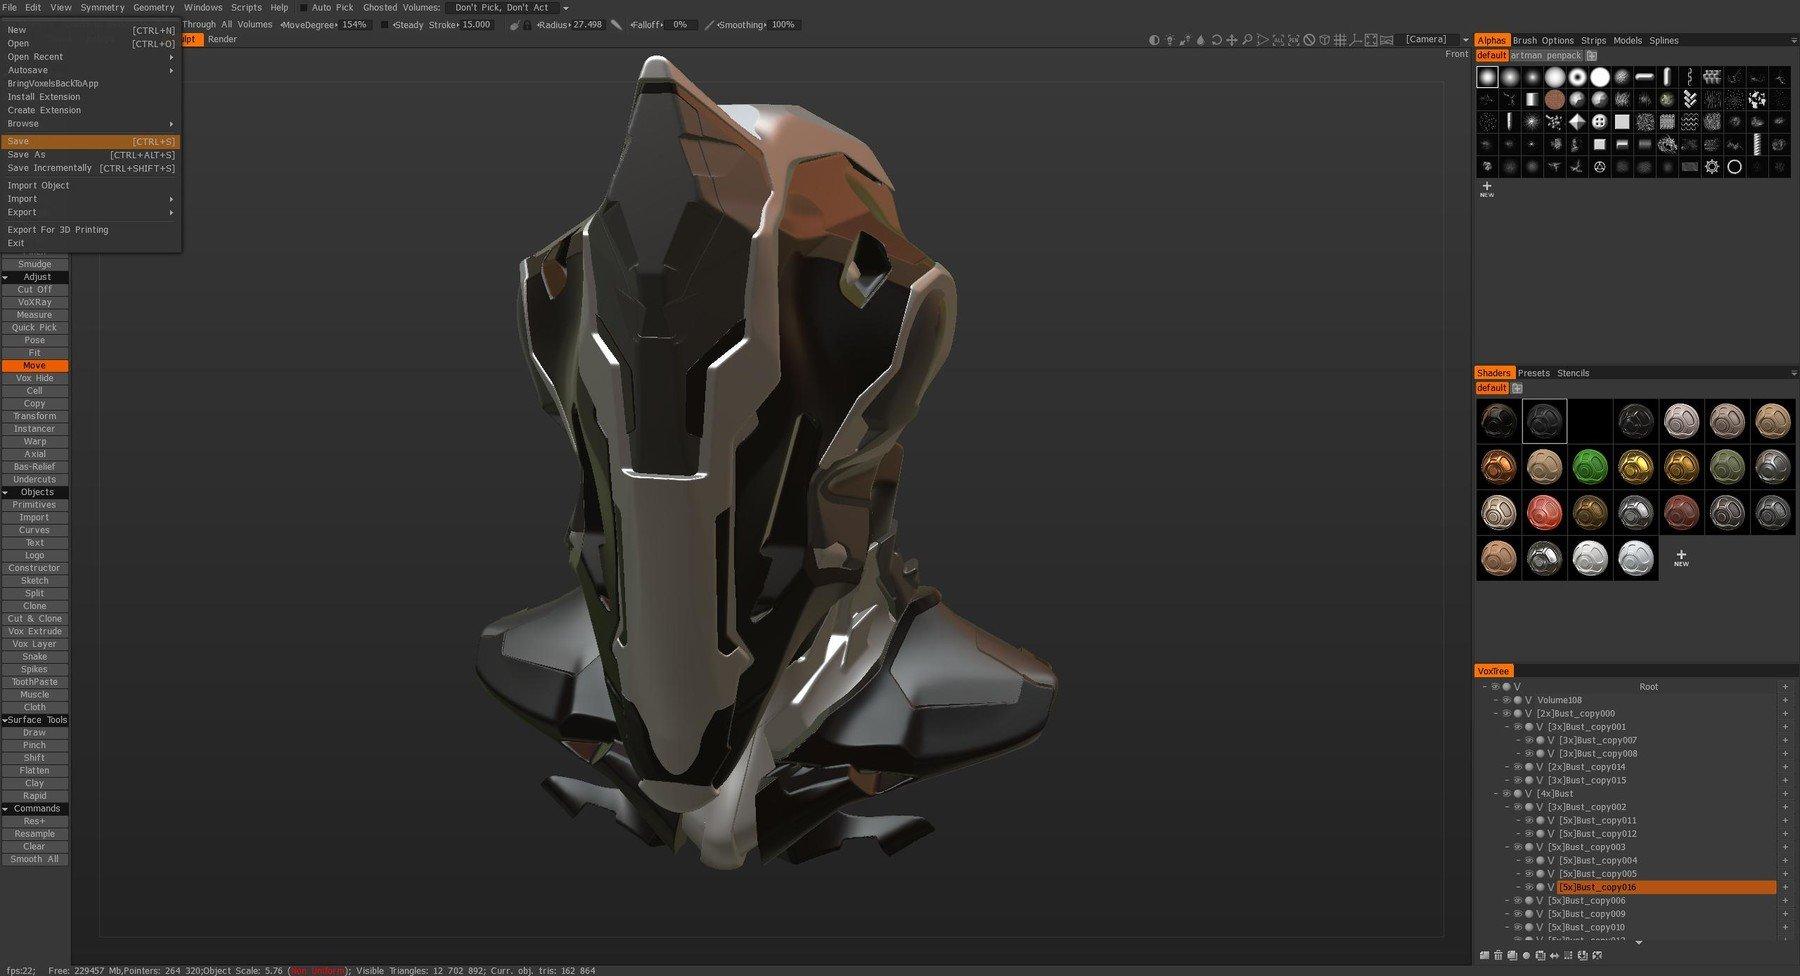 Скриншот из 3D-Coat. Источник:Anthony Jones